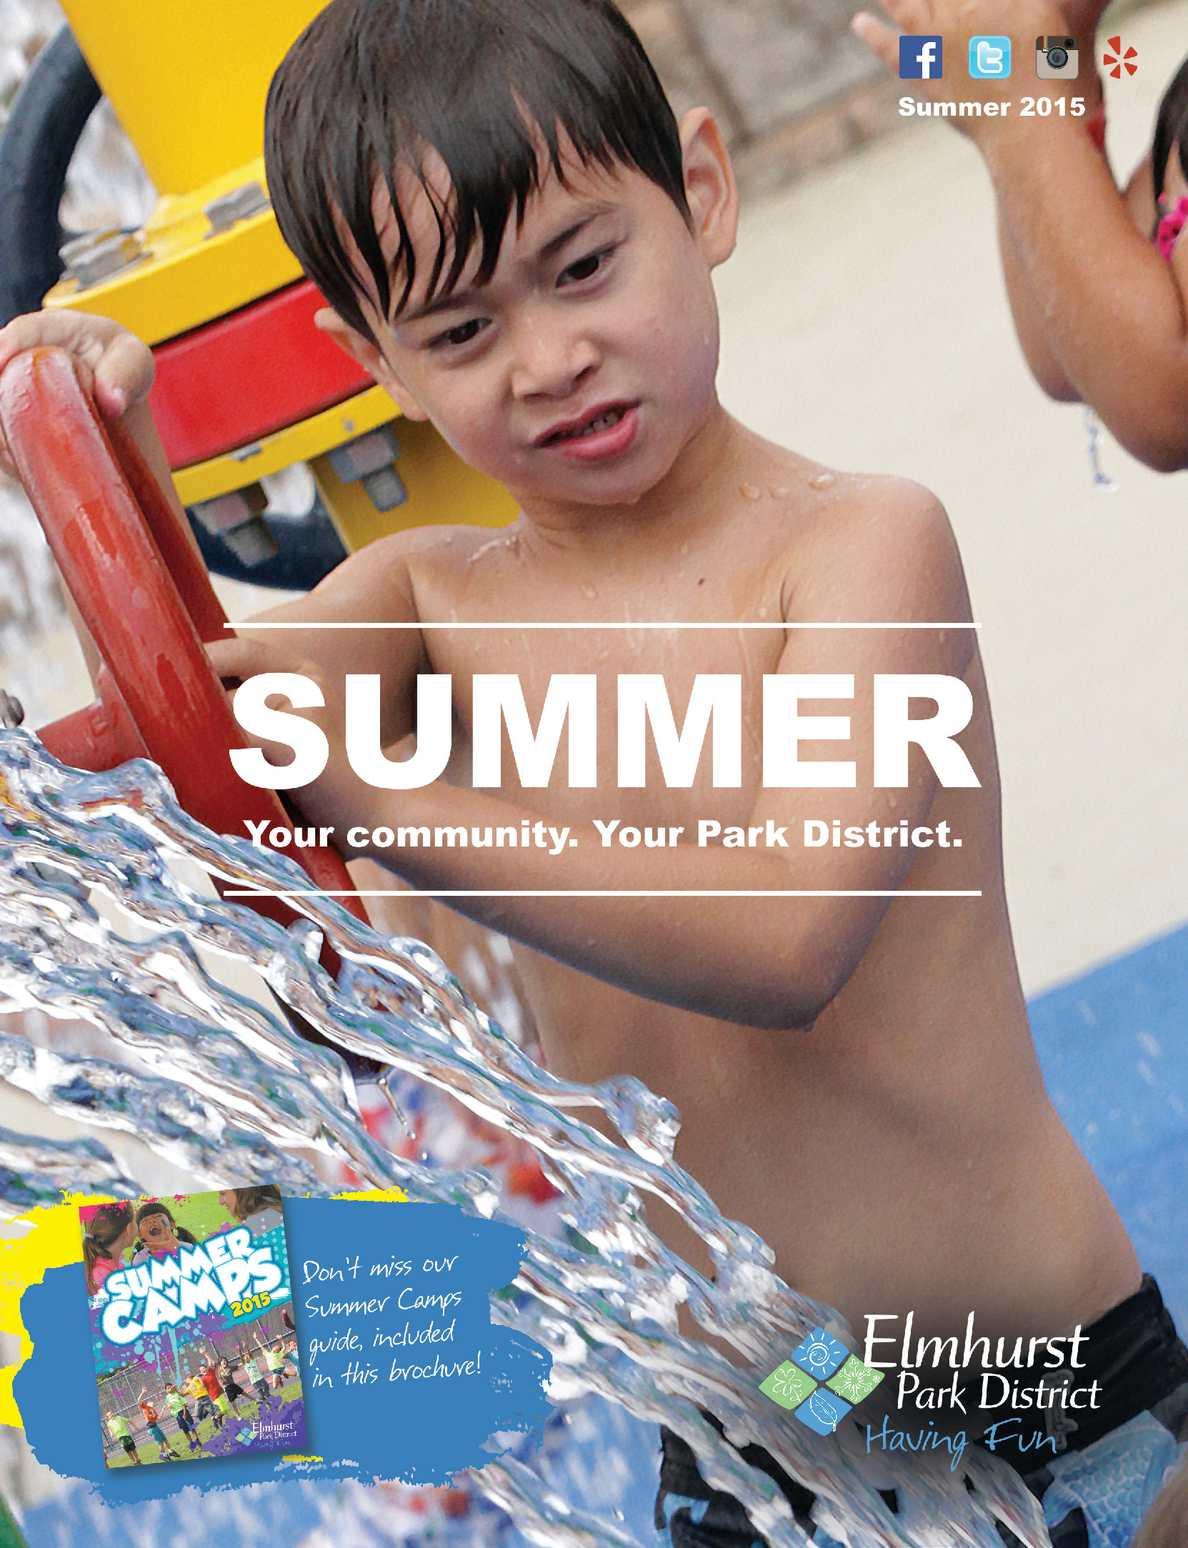 609002f40db89 Calaméo - Elmhurst Park District Summer 2015 Program Guide